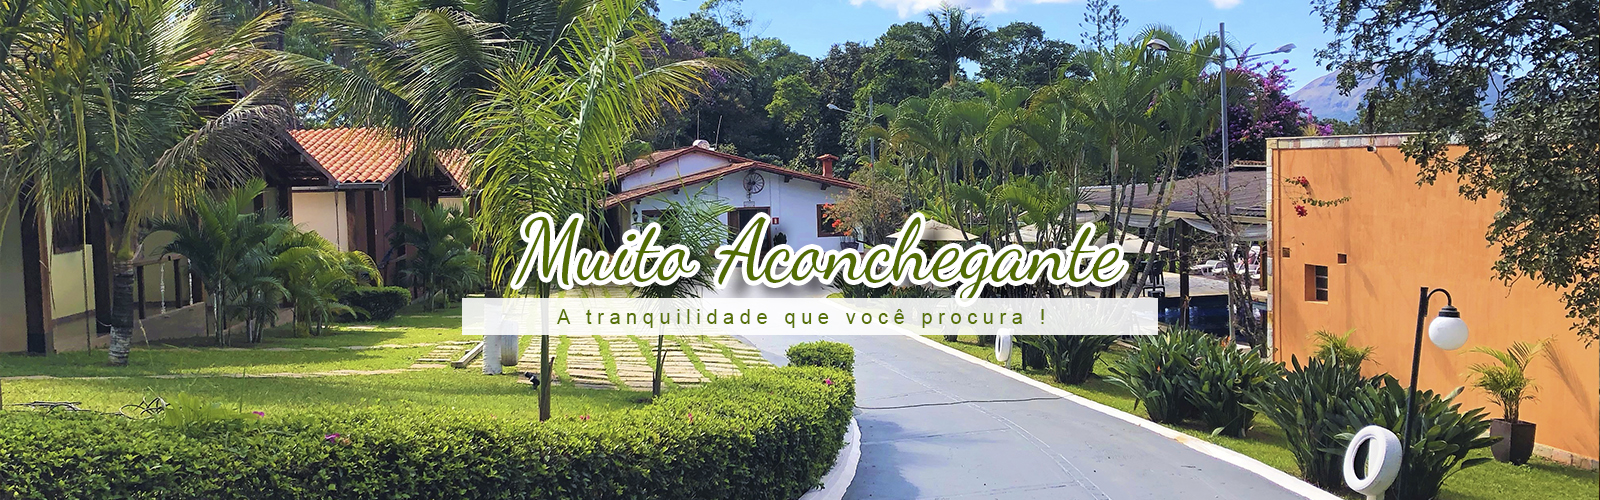 banner_aconchegante_home_1